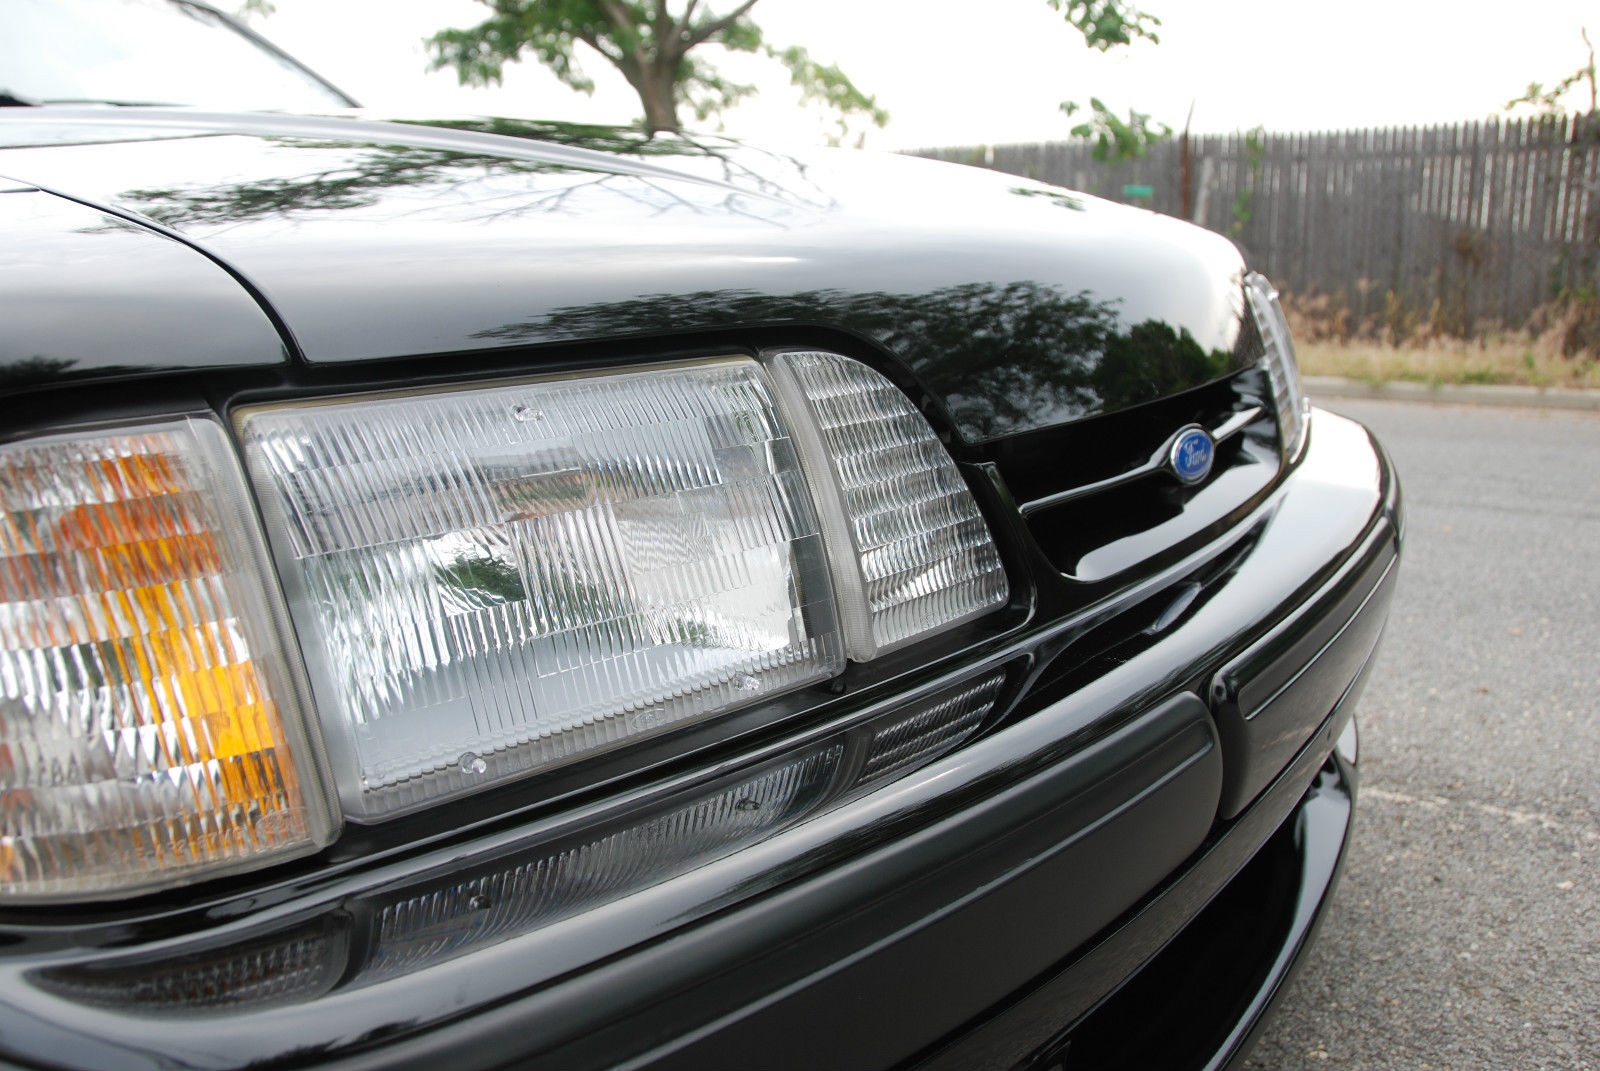 1988 Hatchback 88 0481 Offered On Ebay Saleen Owners And Mustang Fog Lights